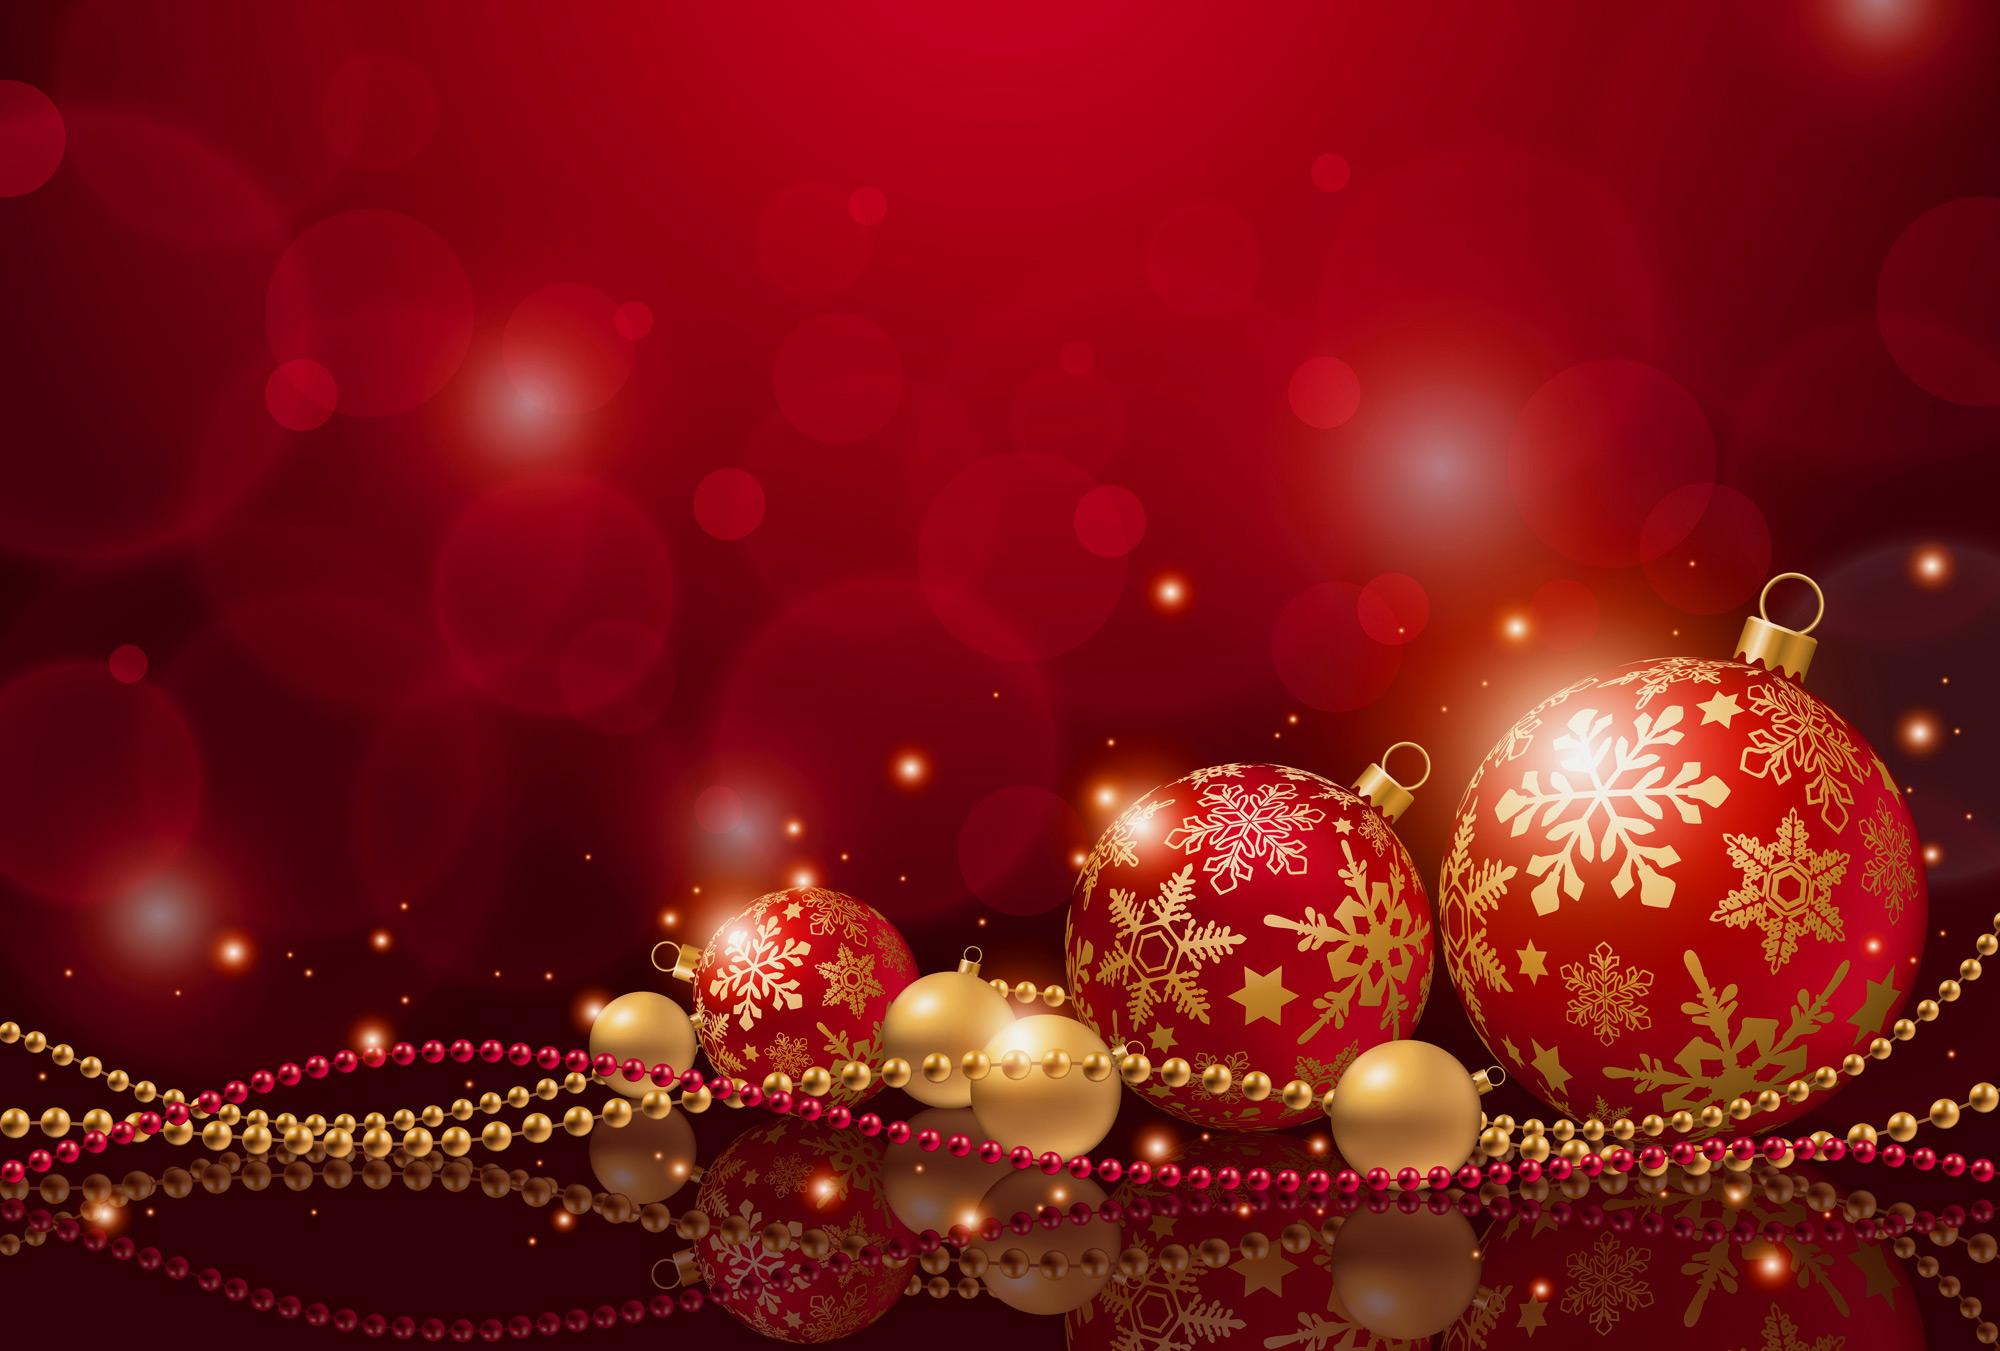 Christmas Background Desktop 1185   HDWPro 2000x1351